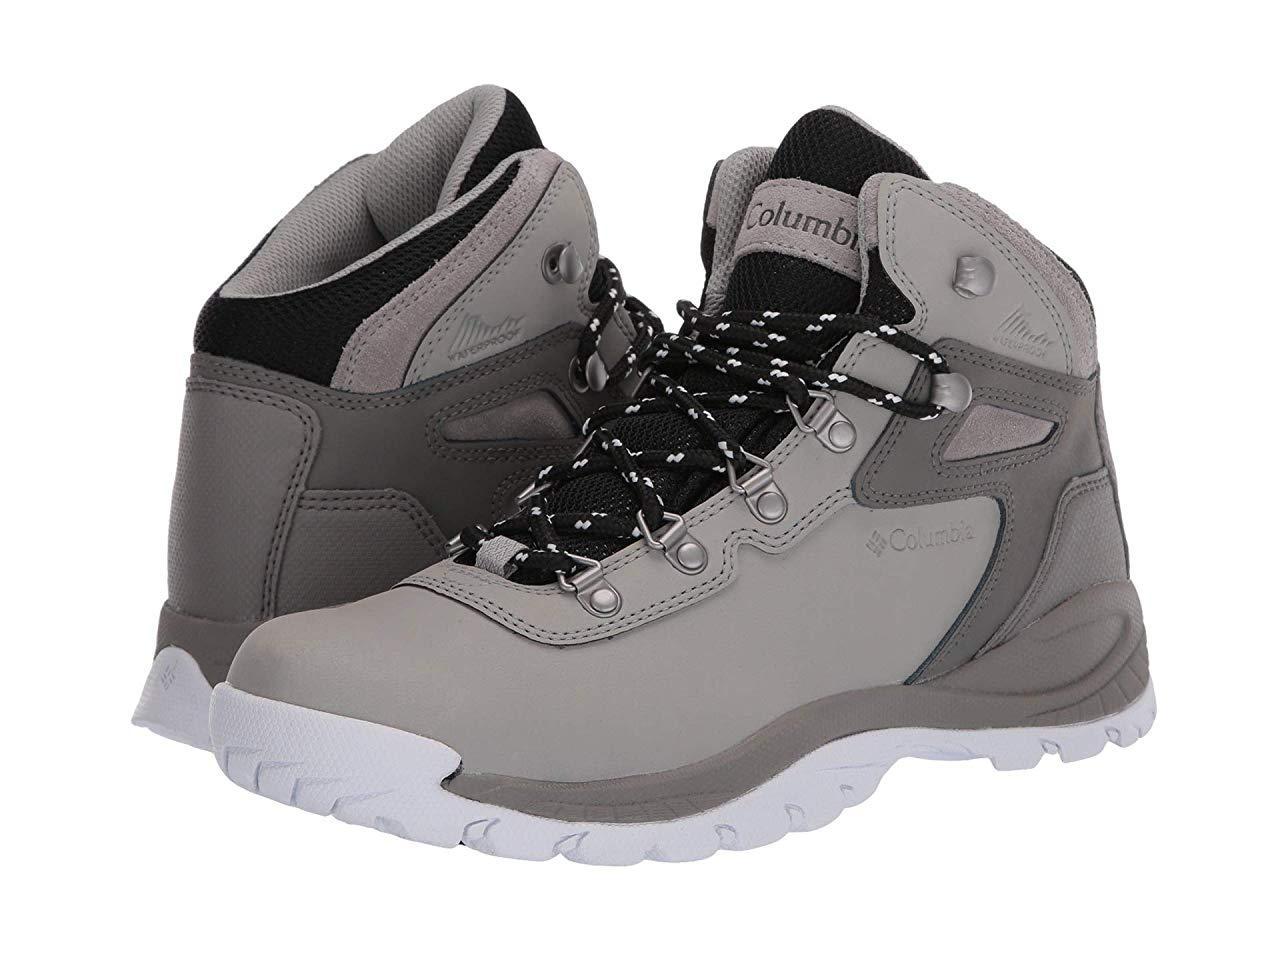 Ботинки/Сапоги Columbia Newton Ridge Plus Dove/White